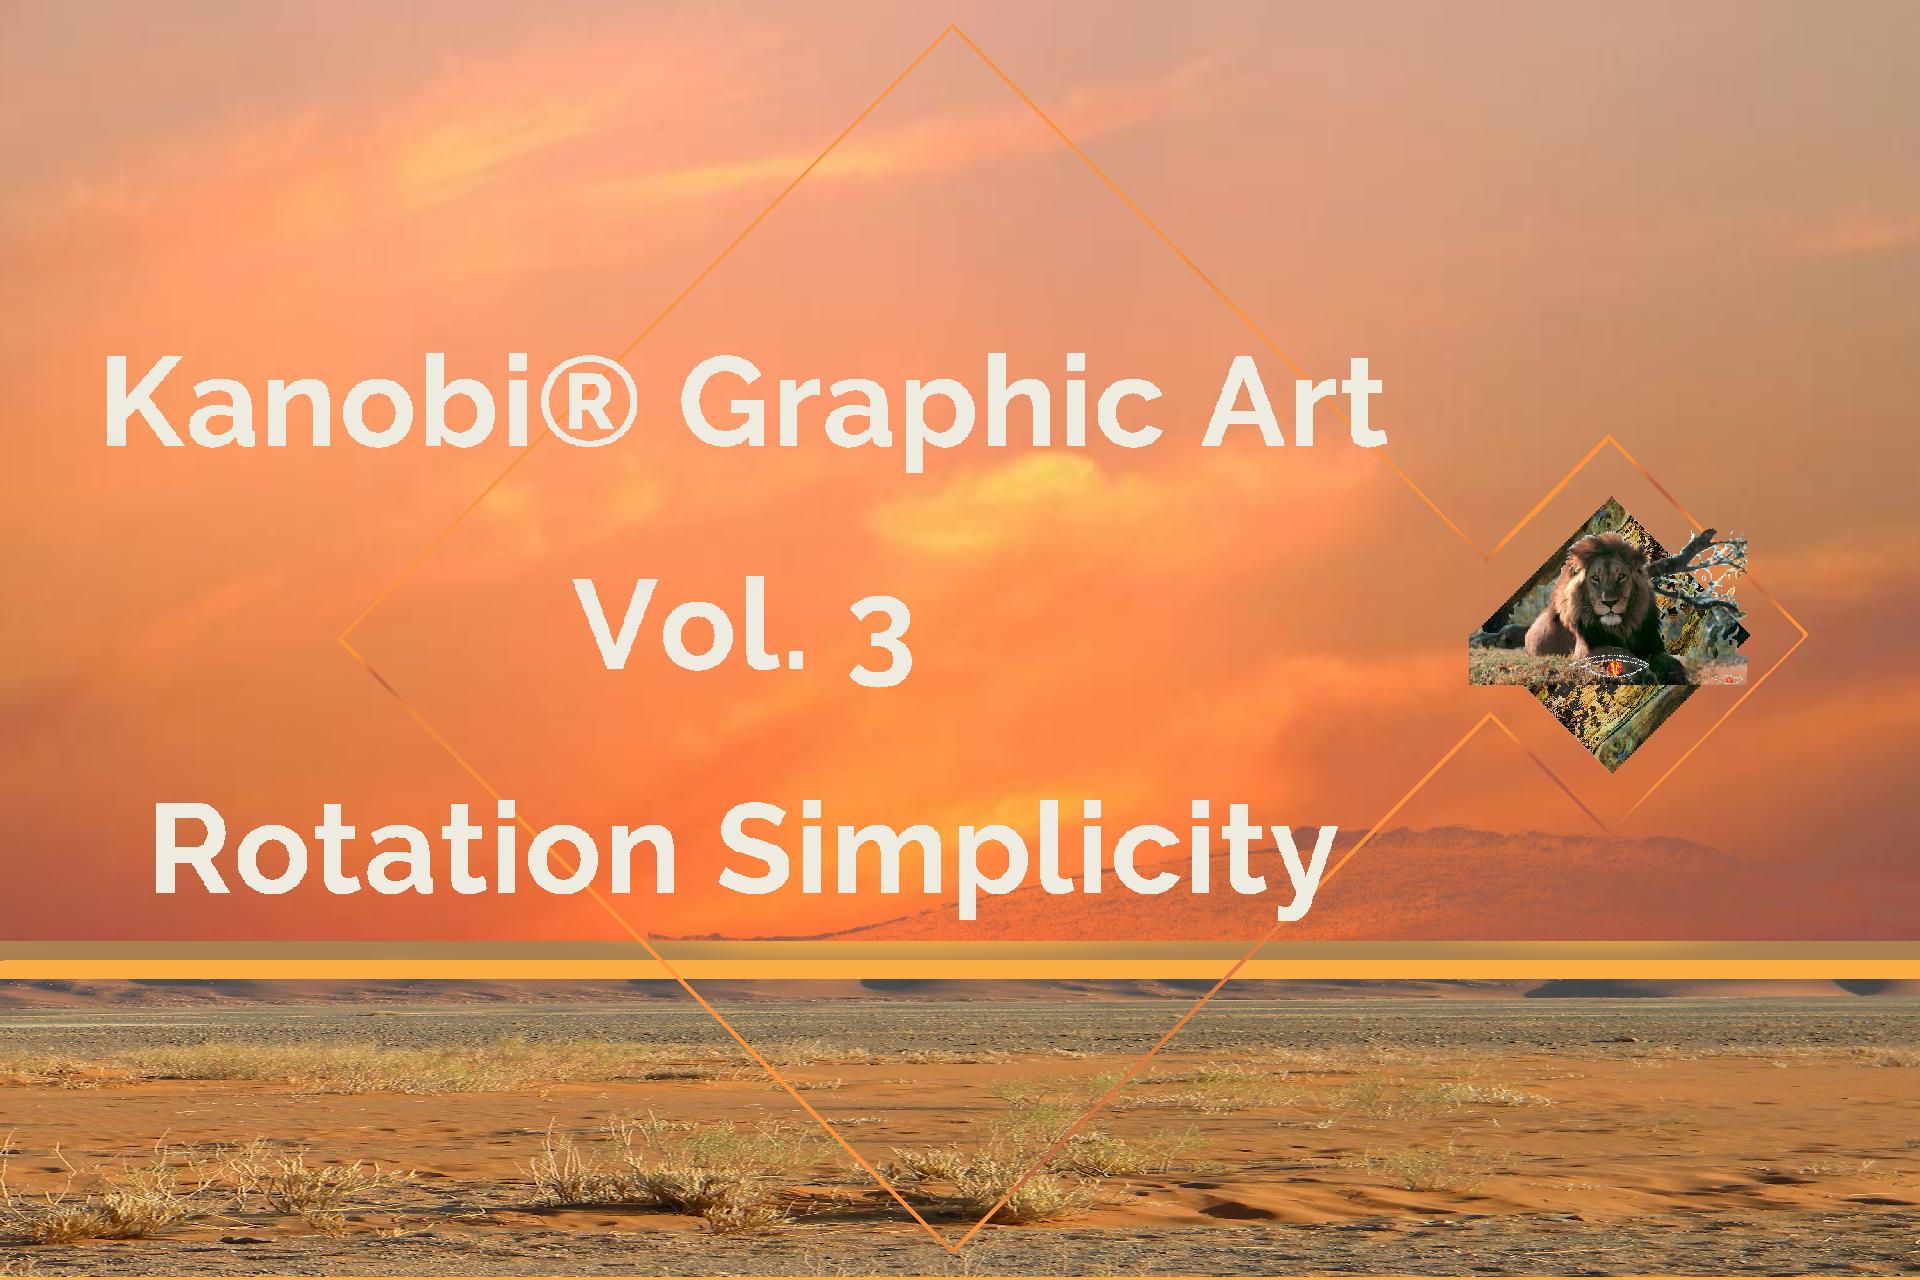 Rotation Simplicity Vol. 3